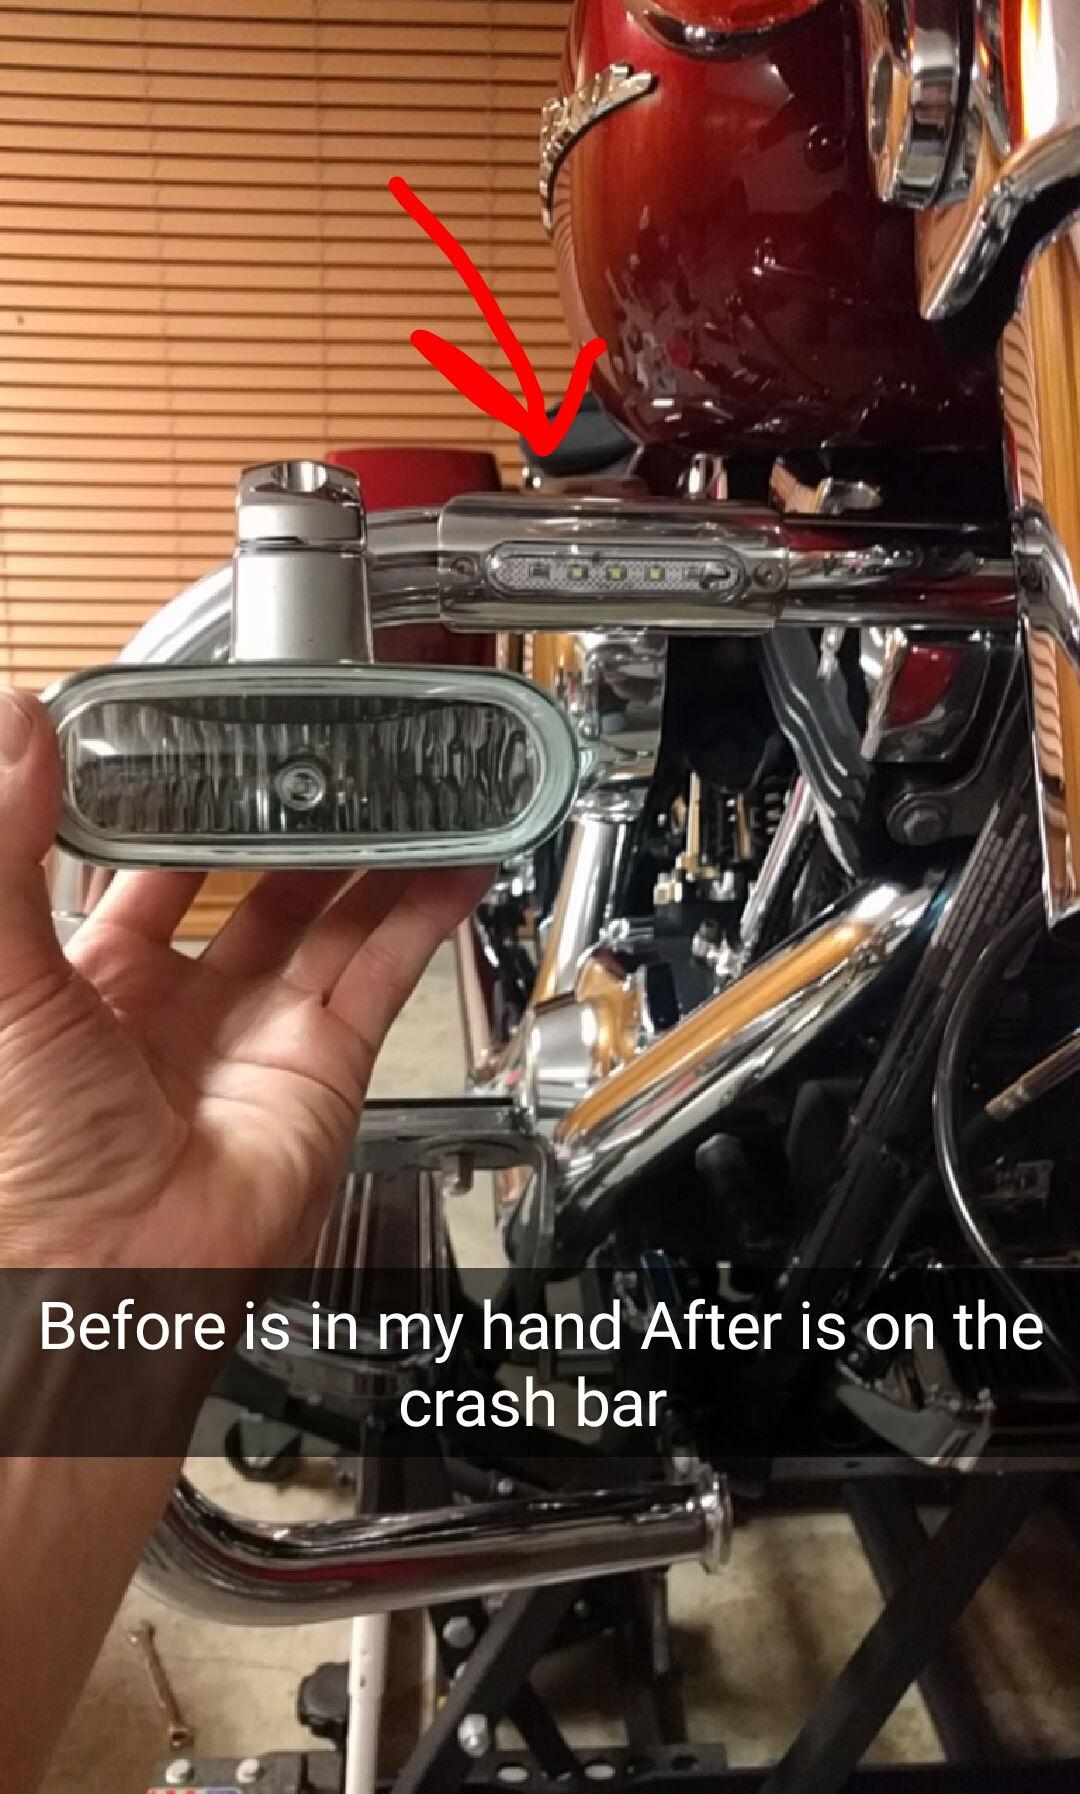 Driving Lights For My 2011 Street Glide Harley Davidson